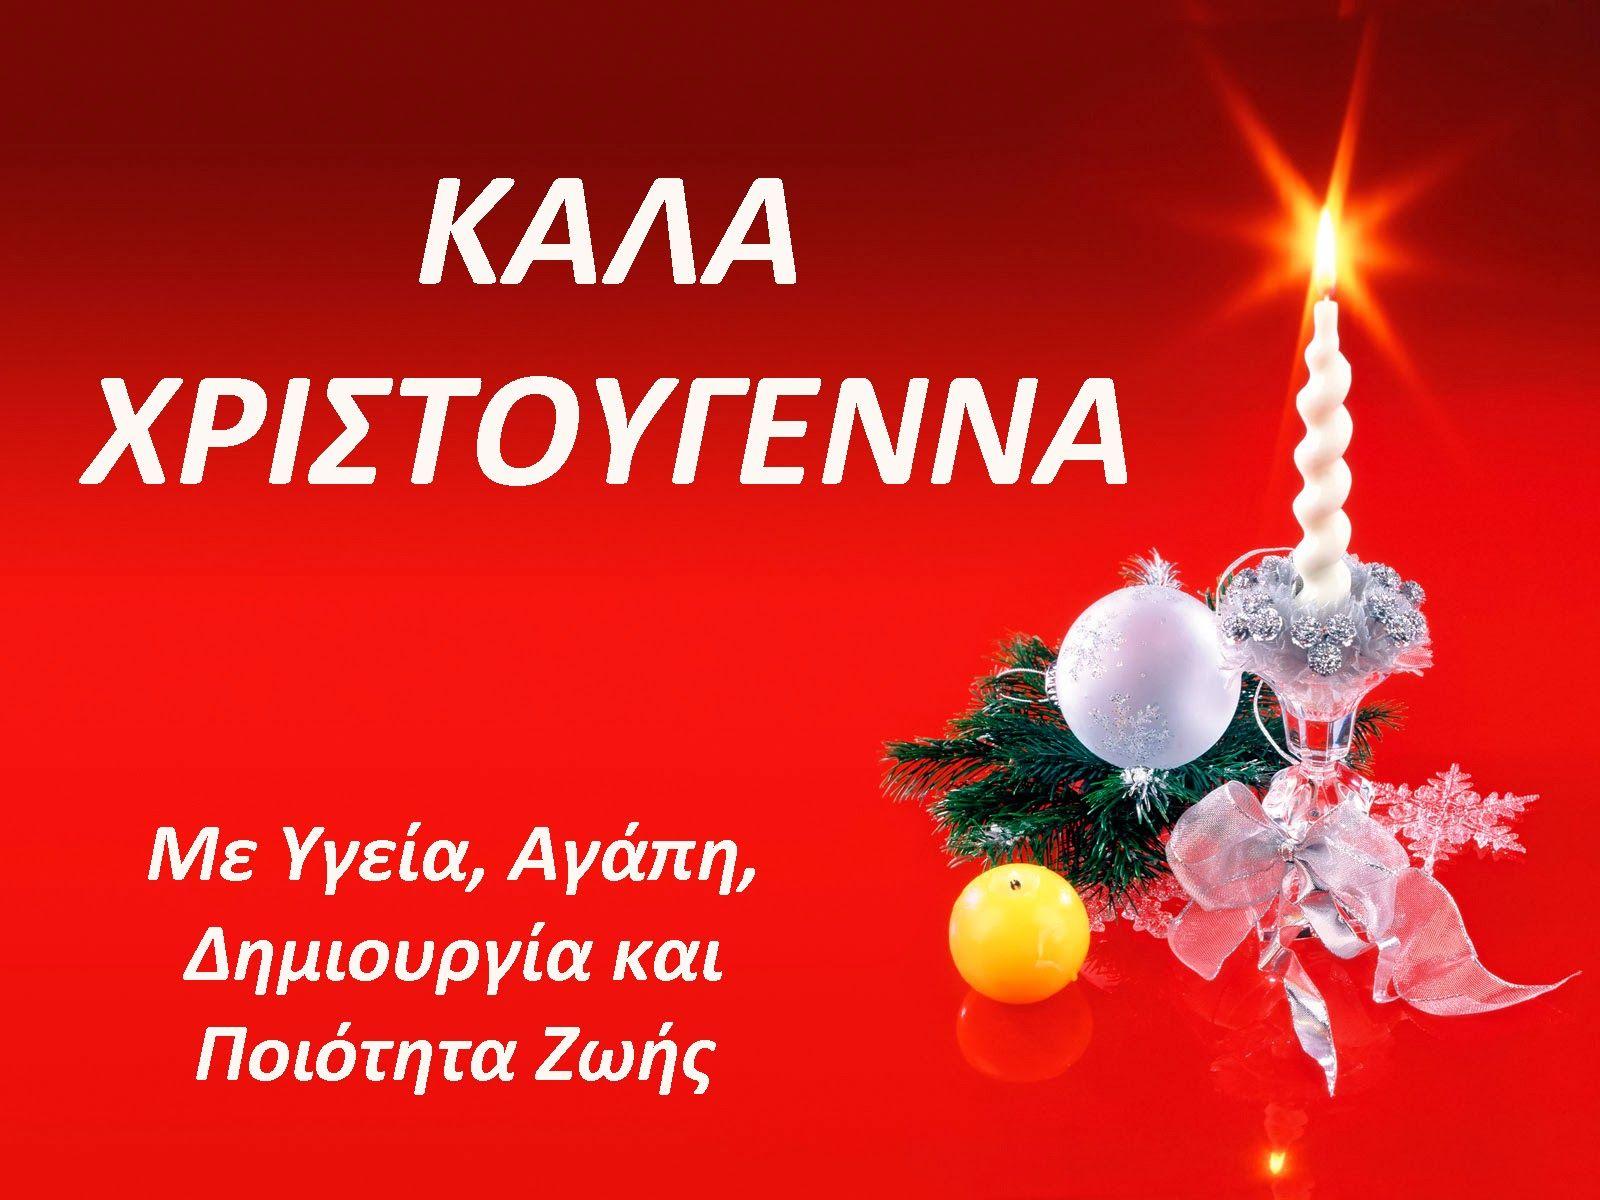 Merry Christmas! Καλά Χριστούγεννα! | Christmas bulbs, Holiday celebration,  Christmas and new year